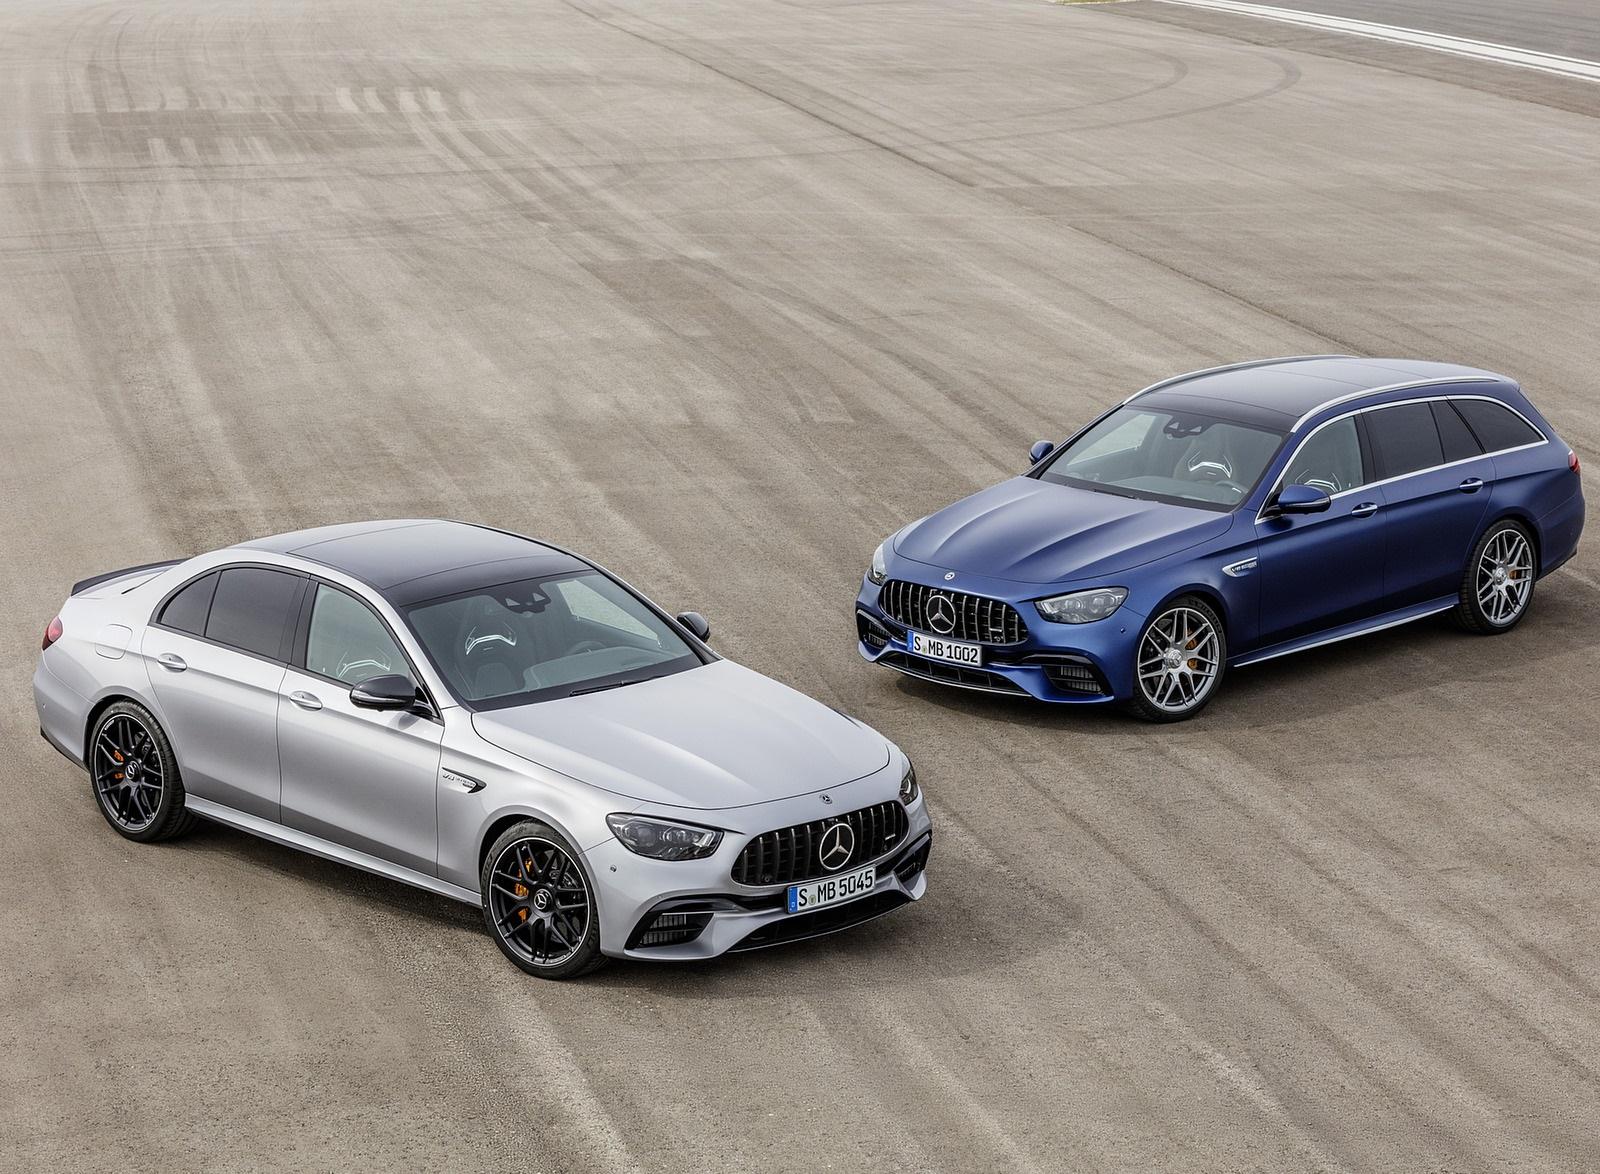 2021 Mercedes-AMG E 63 S Sedan and Estate Wallpapers (9)